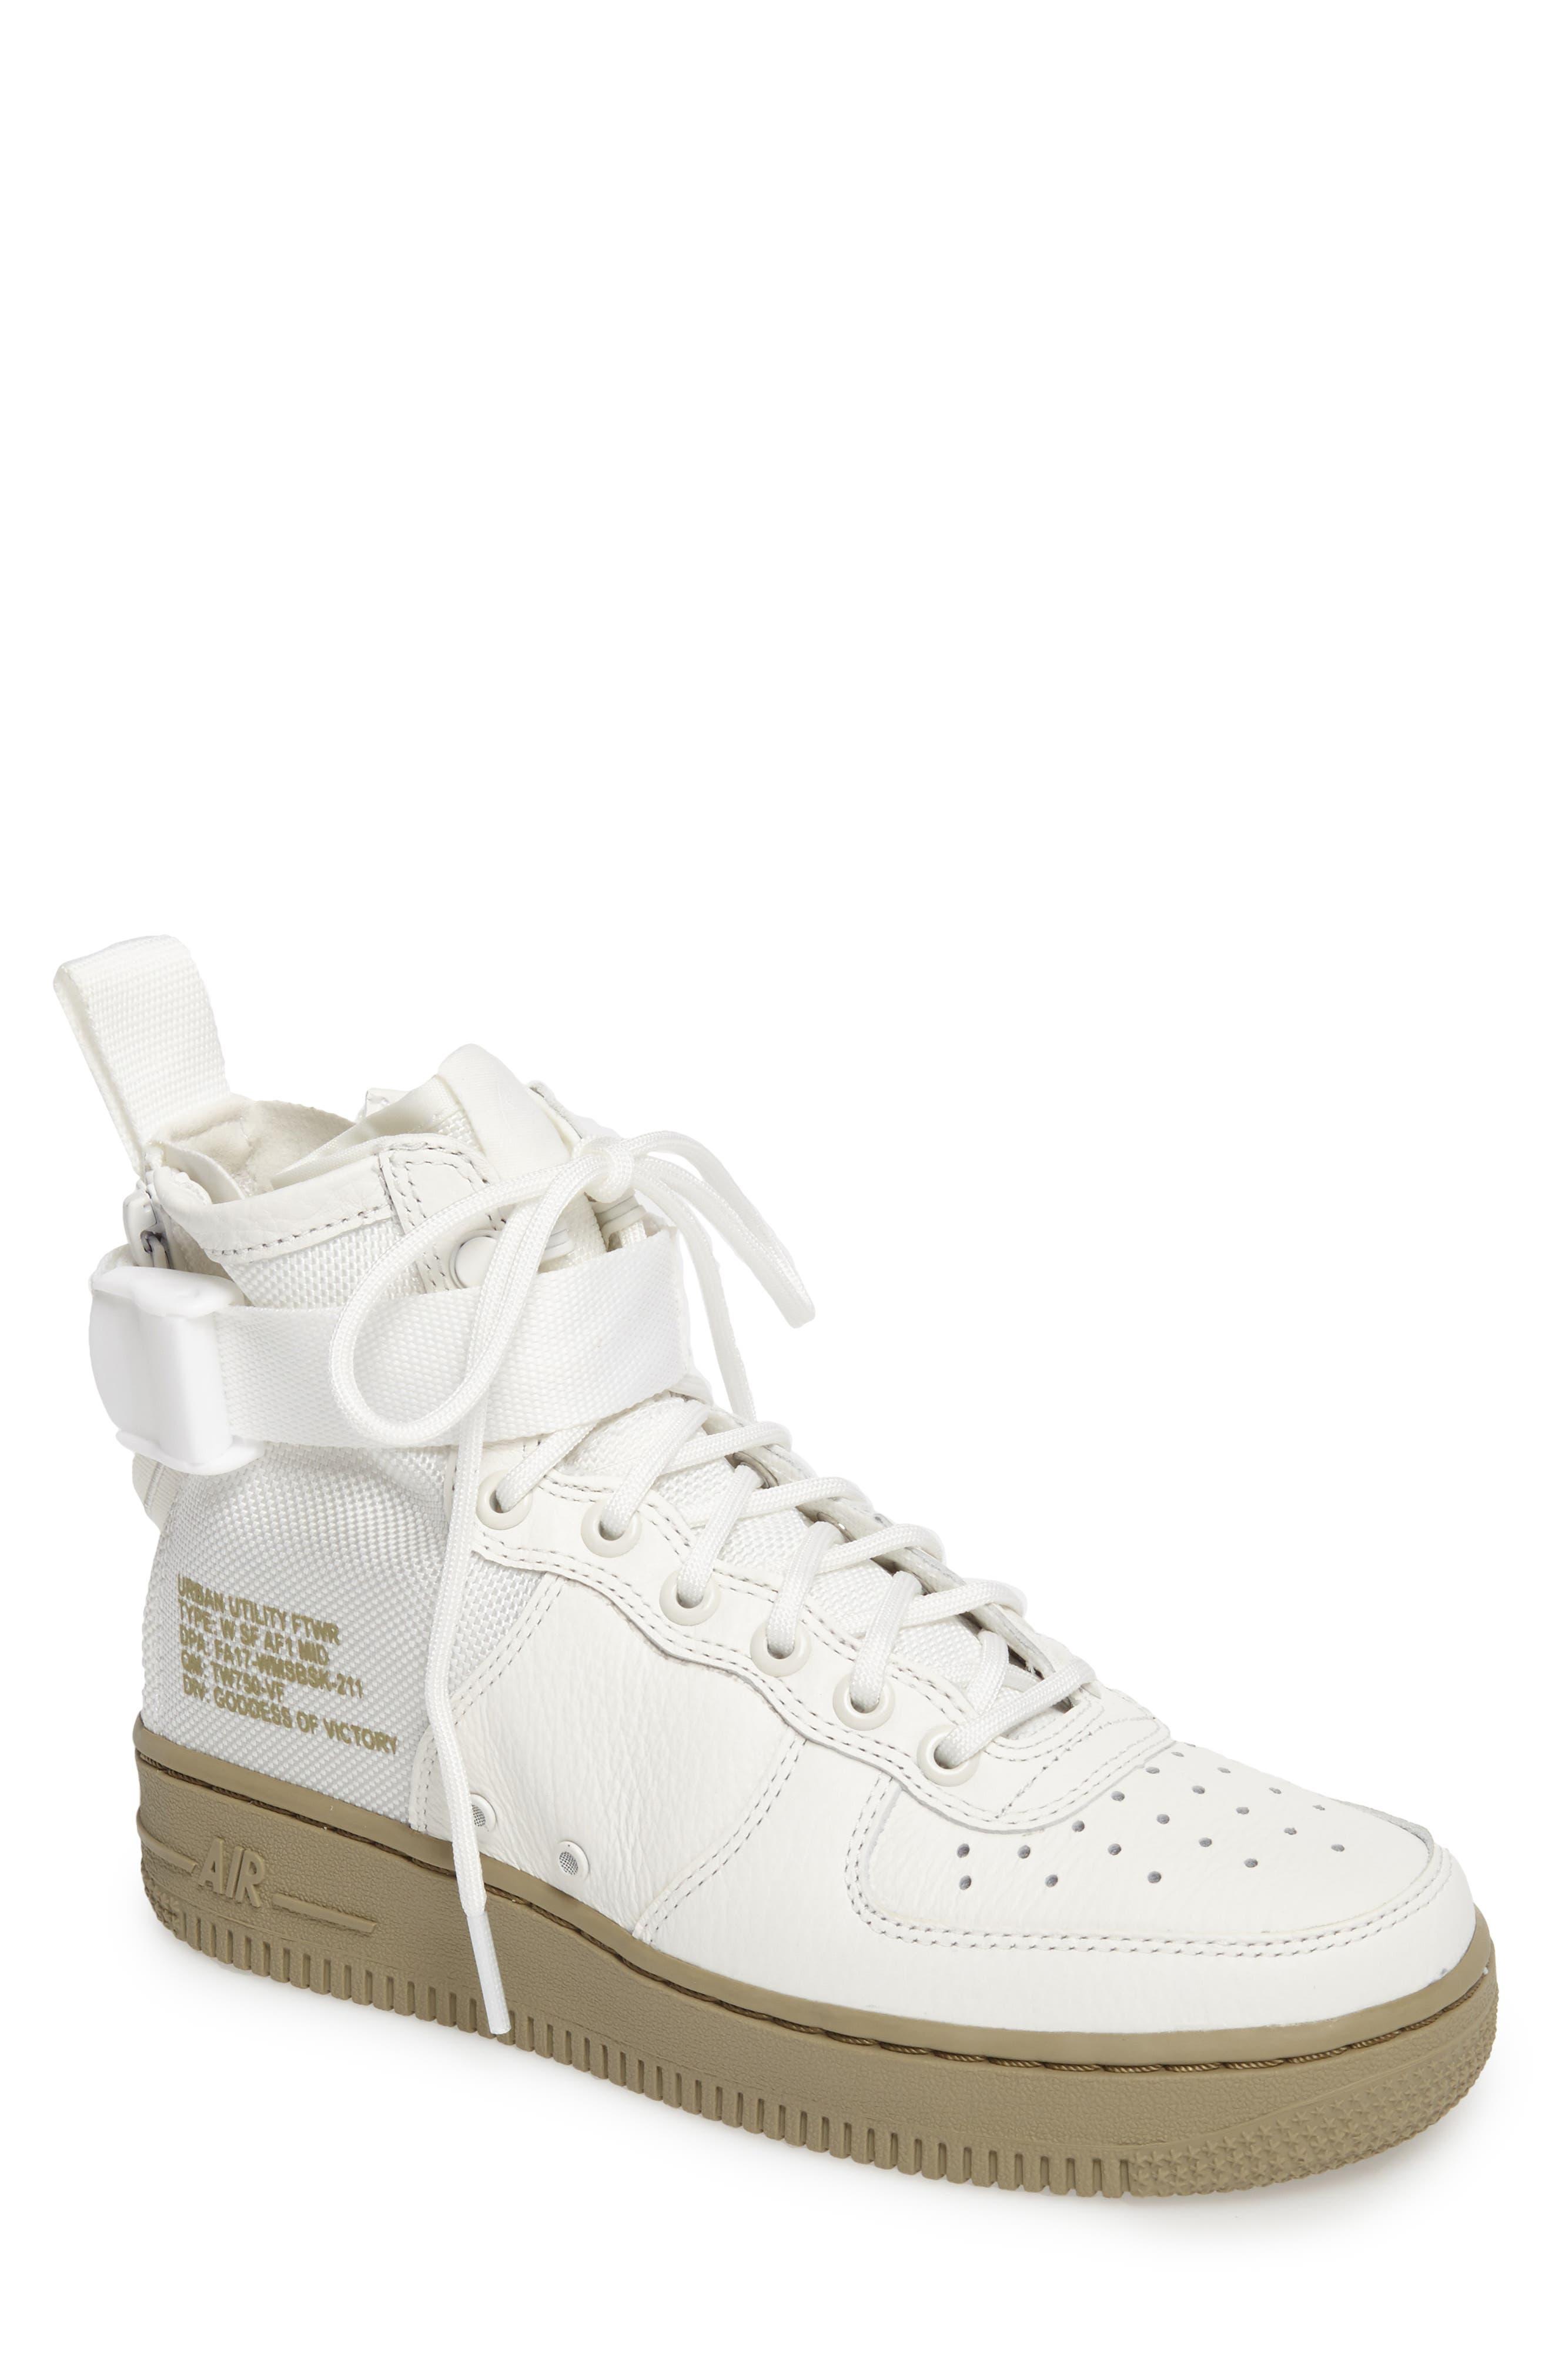 Alternate Image 1 Selected - Nike SF Air Force 1 Mid Sneaker (Women)